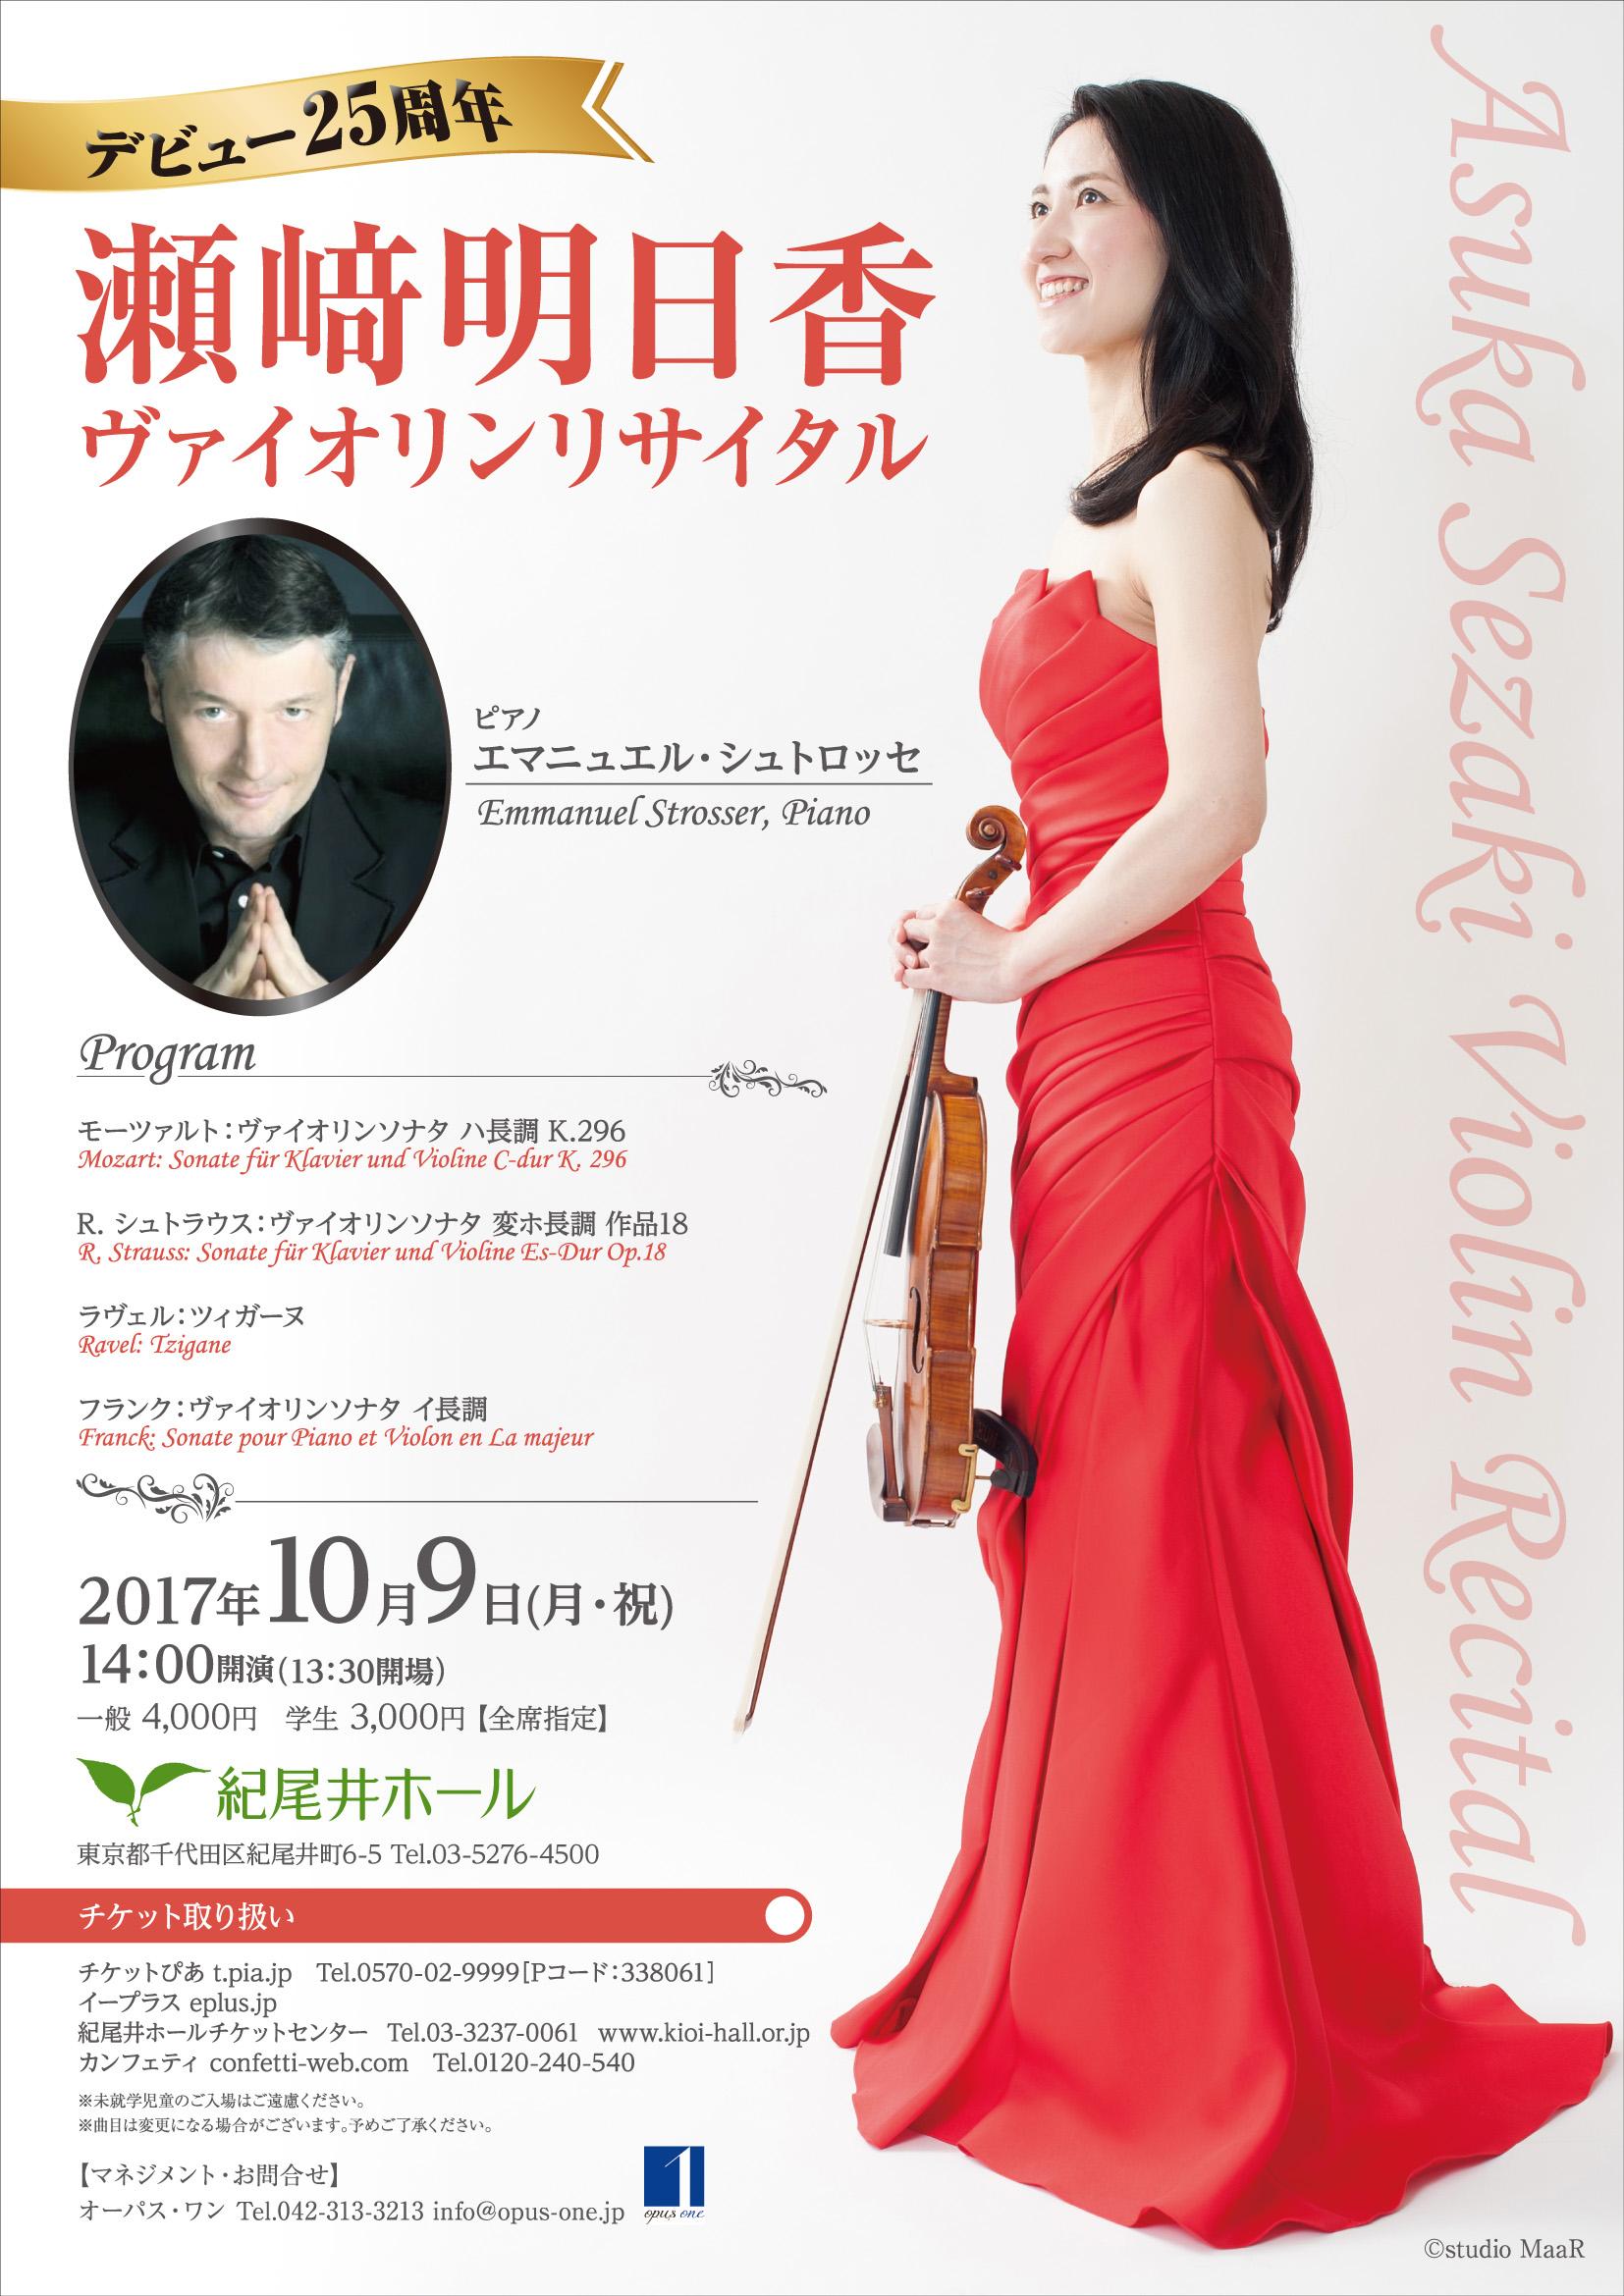 LE118_sezakiasuka_violin_recital_omo_A4_07ol